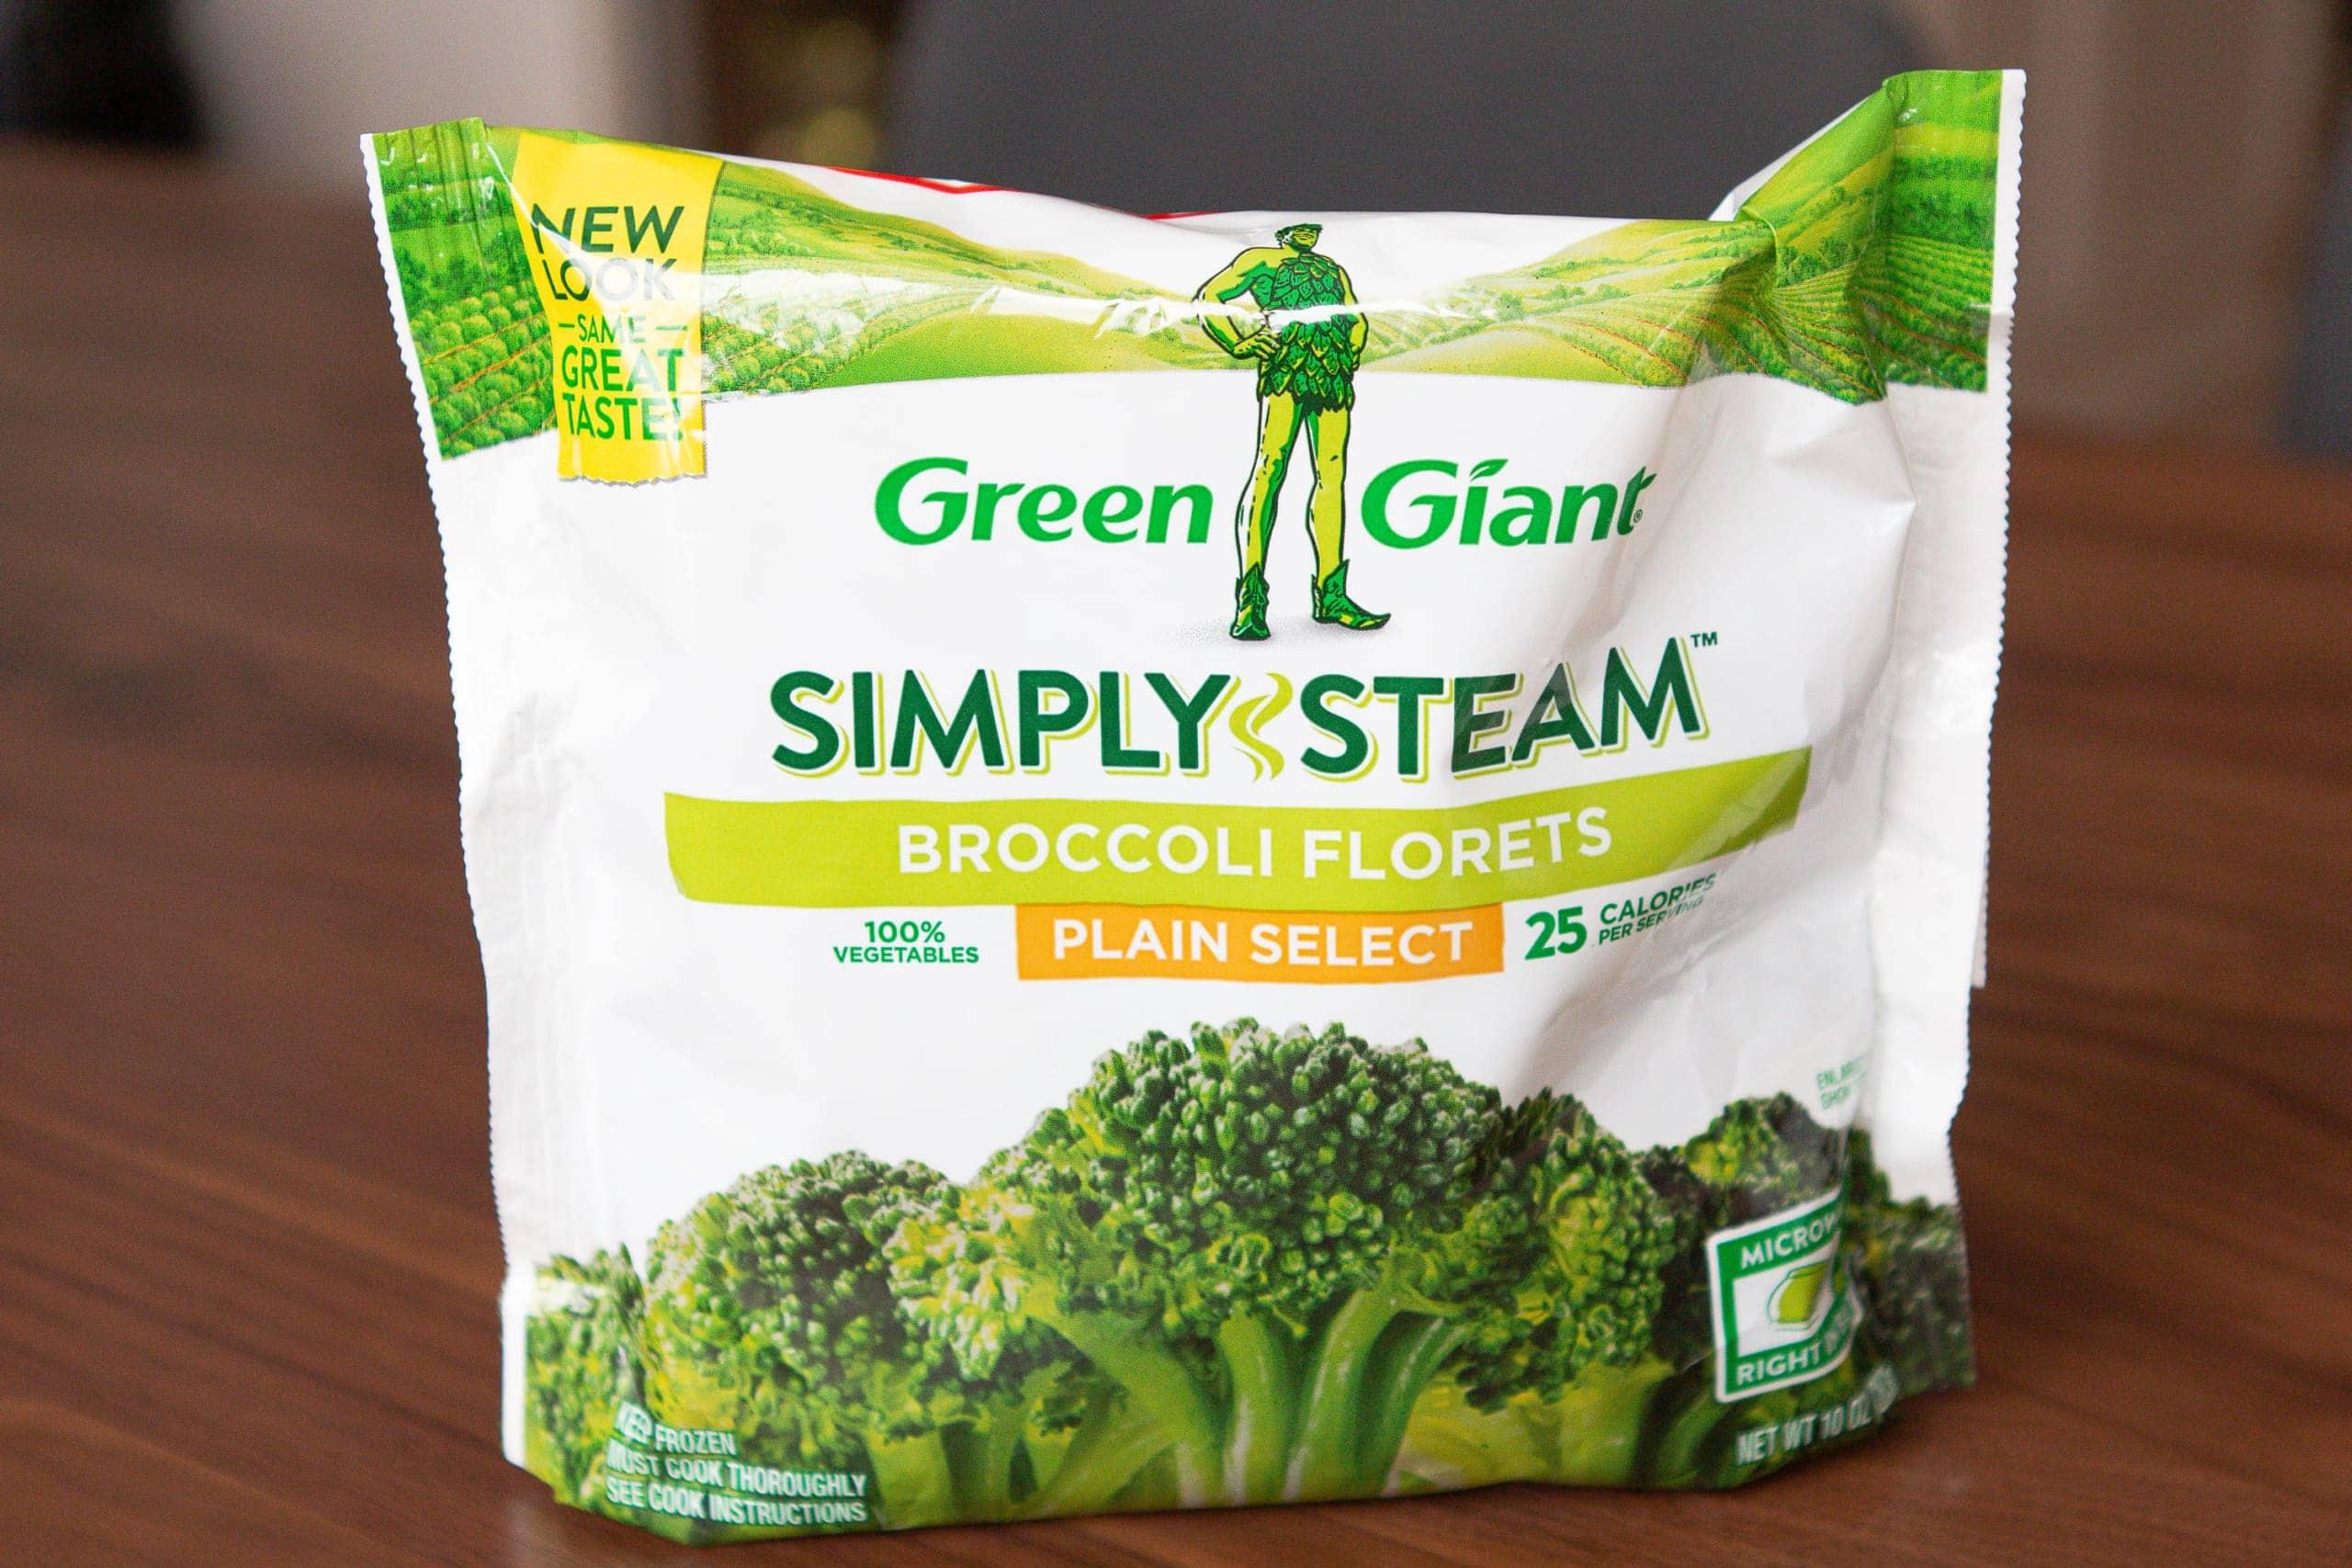 Steamed veggies in a bag